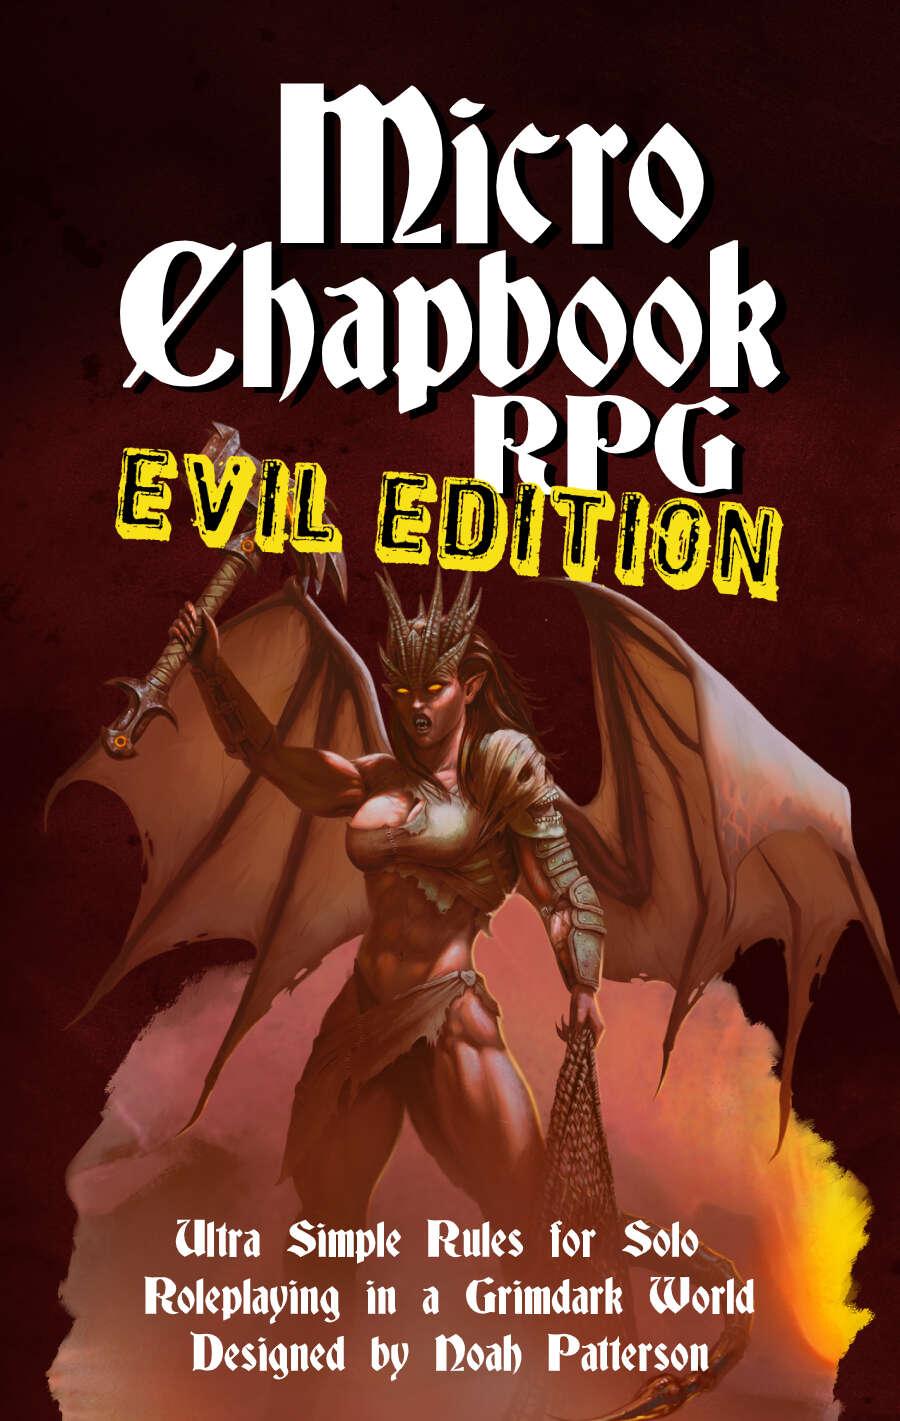 Micro Chapbook RPG: EVIL EDITION